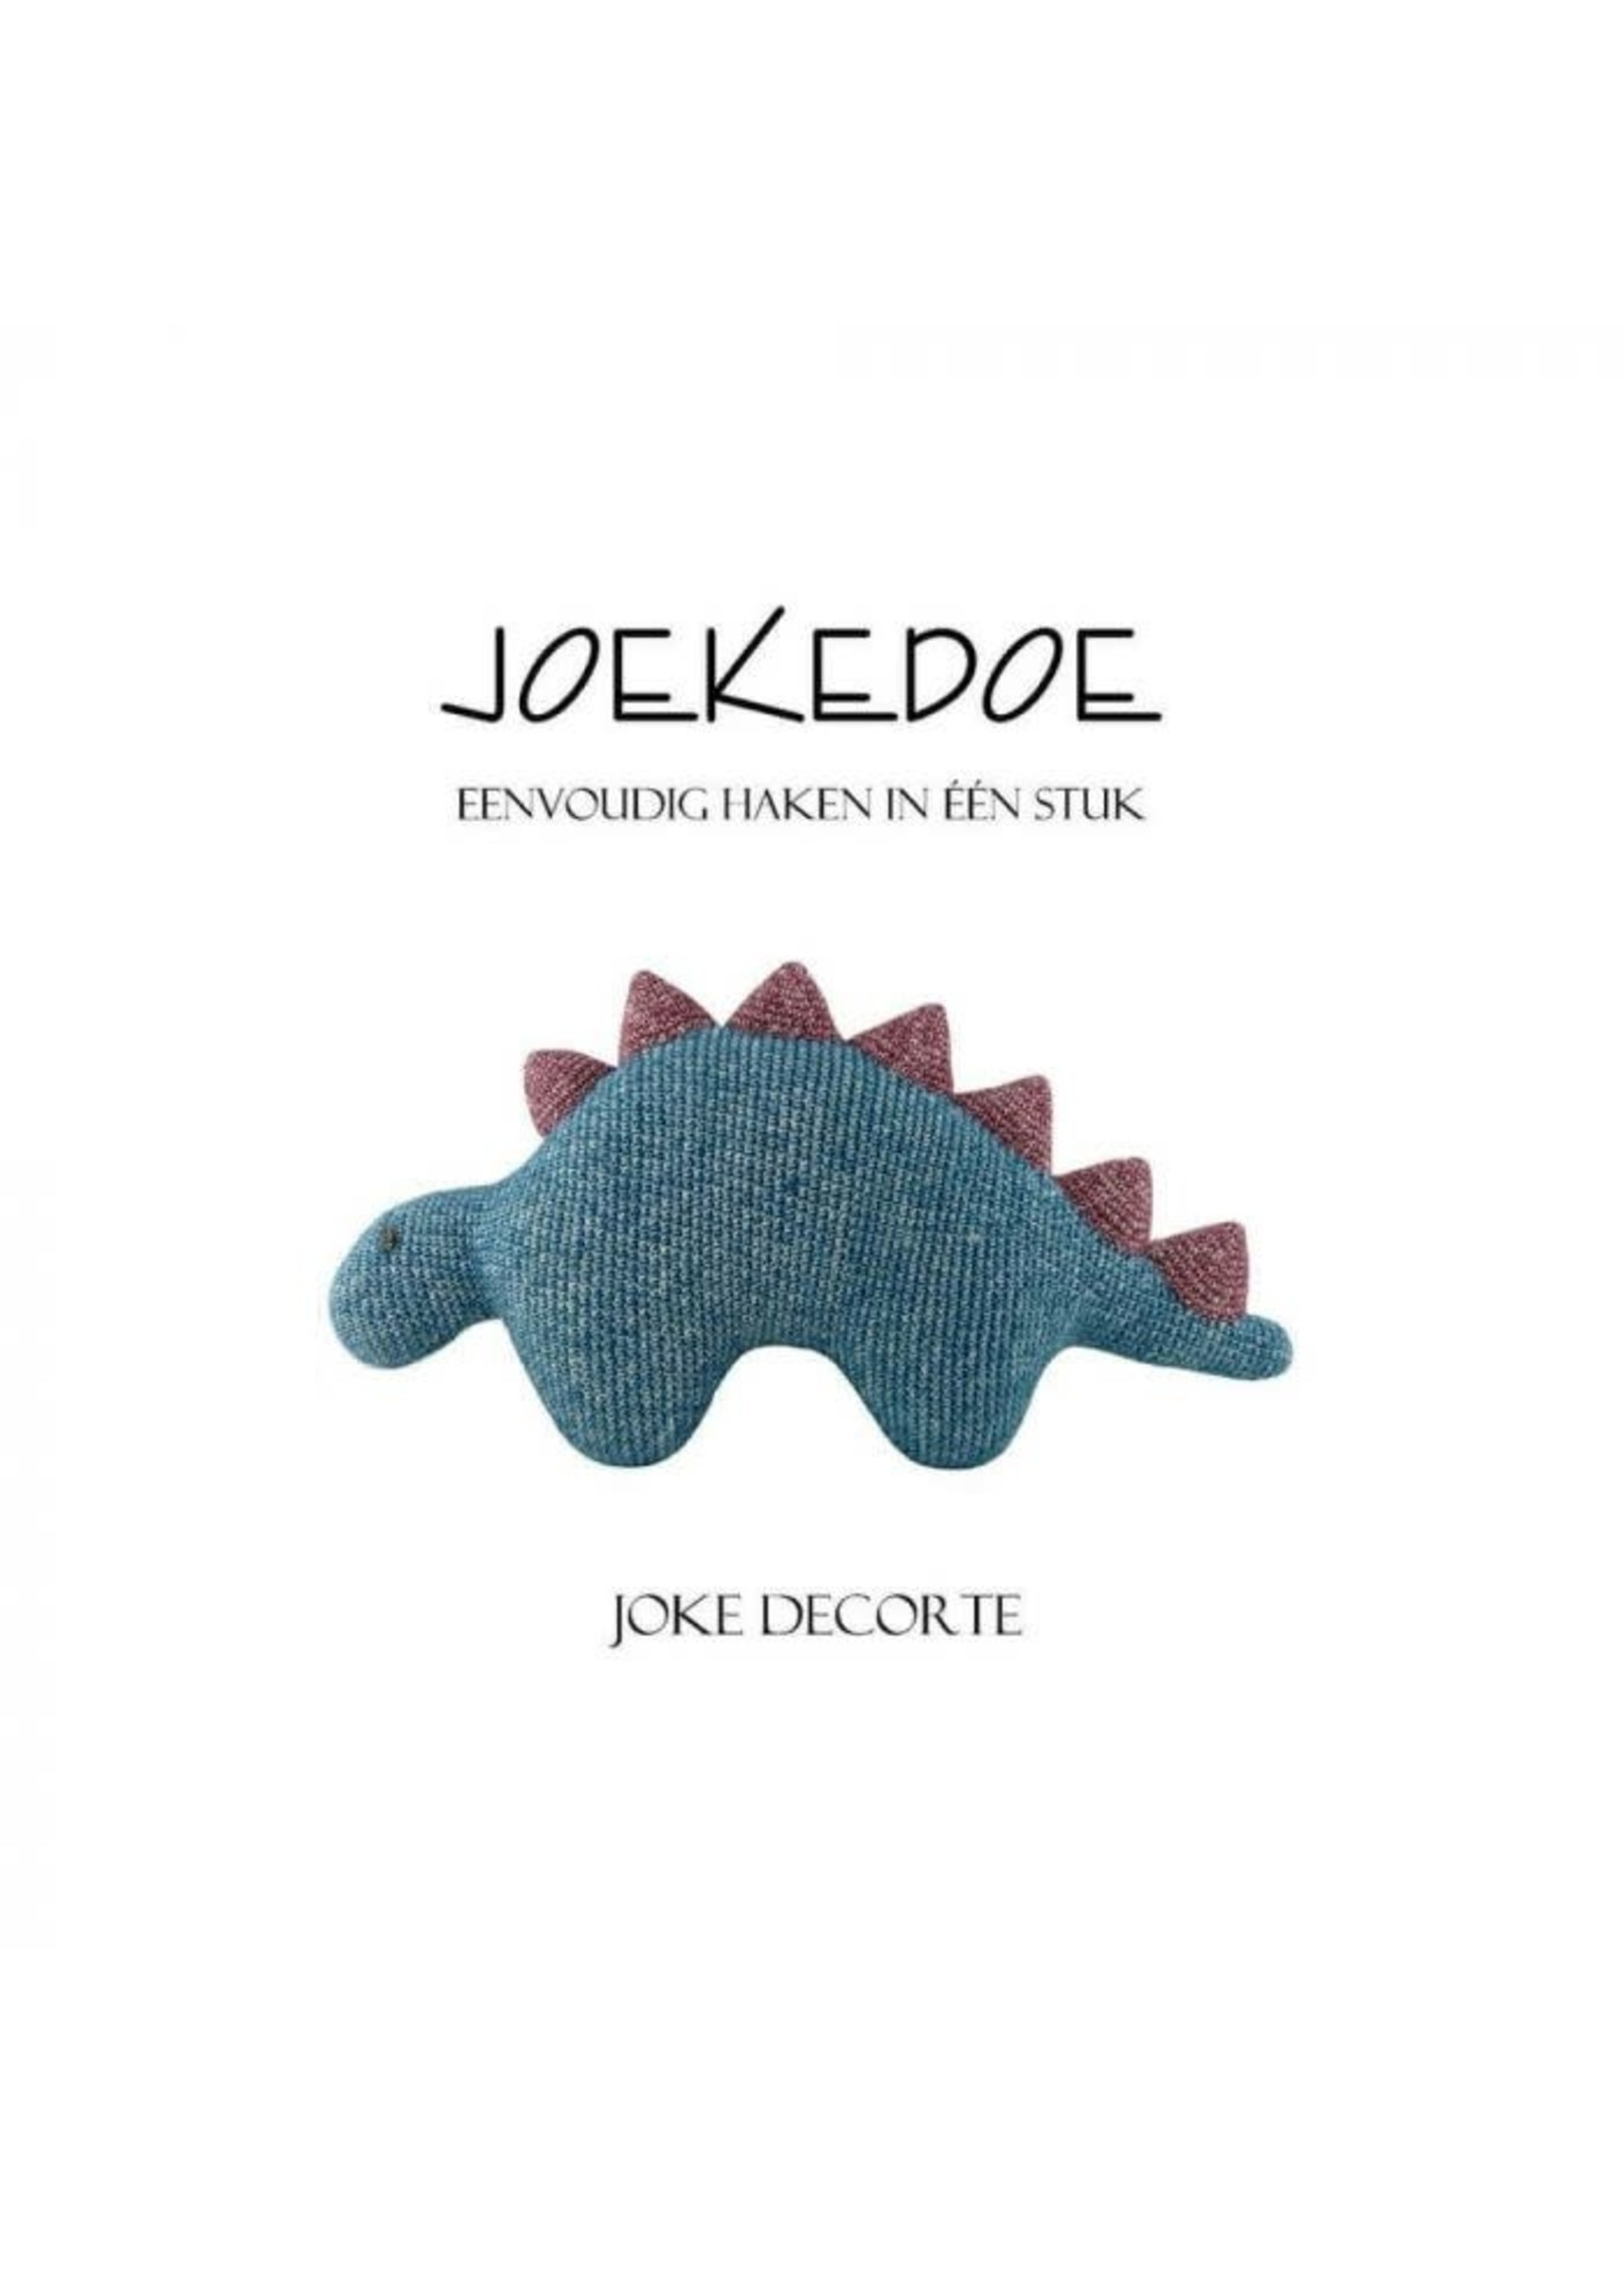 Joekedoe - Joke Decorte